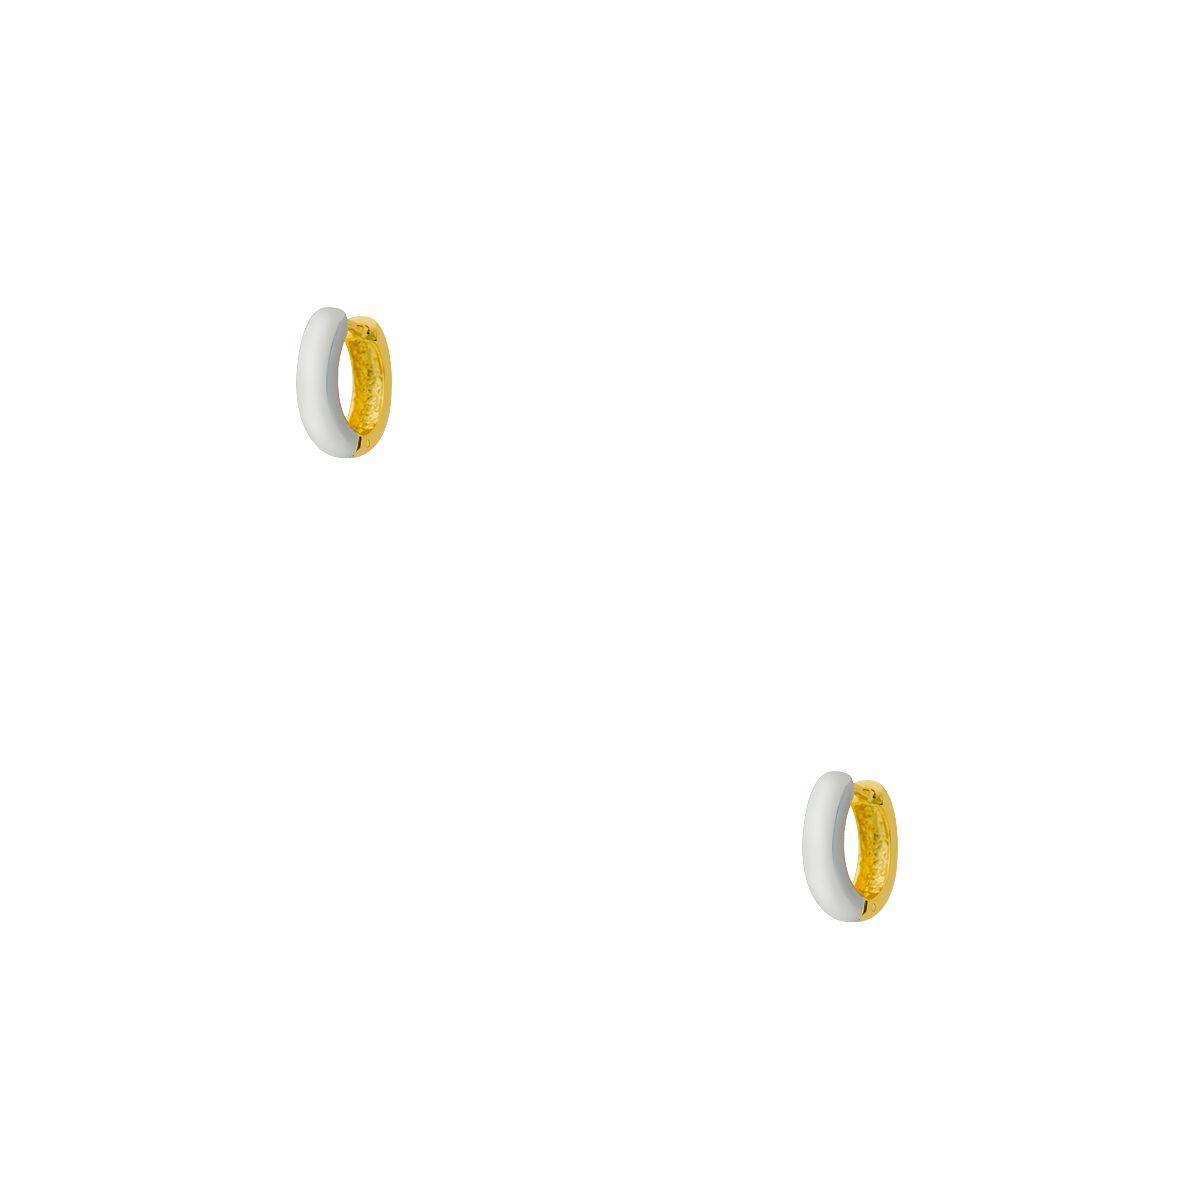 d2aac42310f42 Brinco de Ouro Branco e Amarelo 18k Argola Bicolor br05907 - Joiasgold R   1.129,59 à vista. Adicionar à sacola